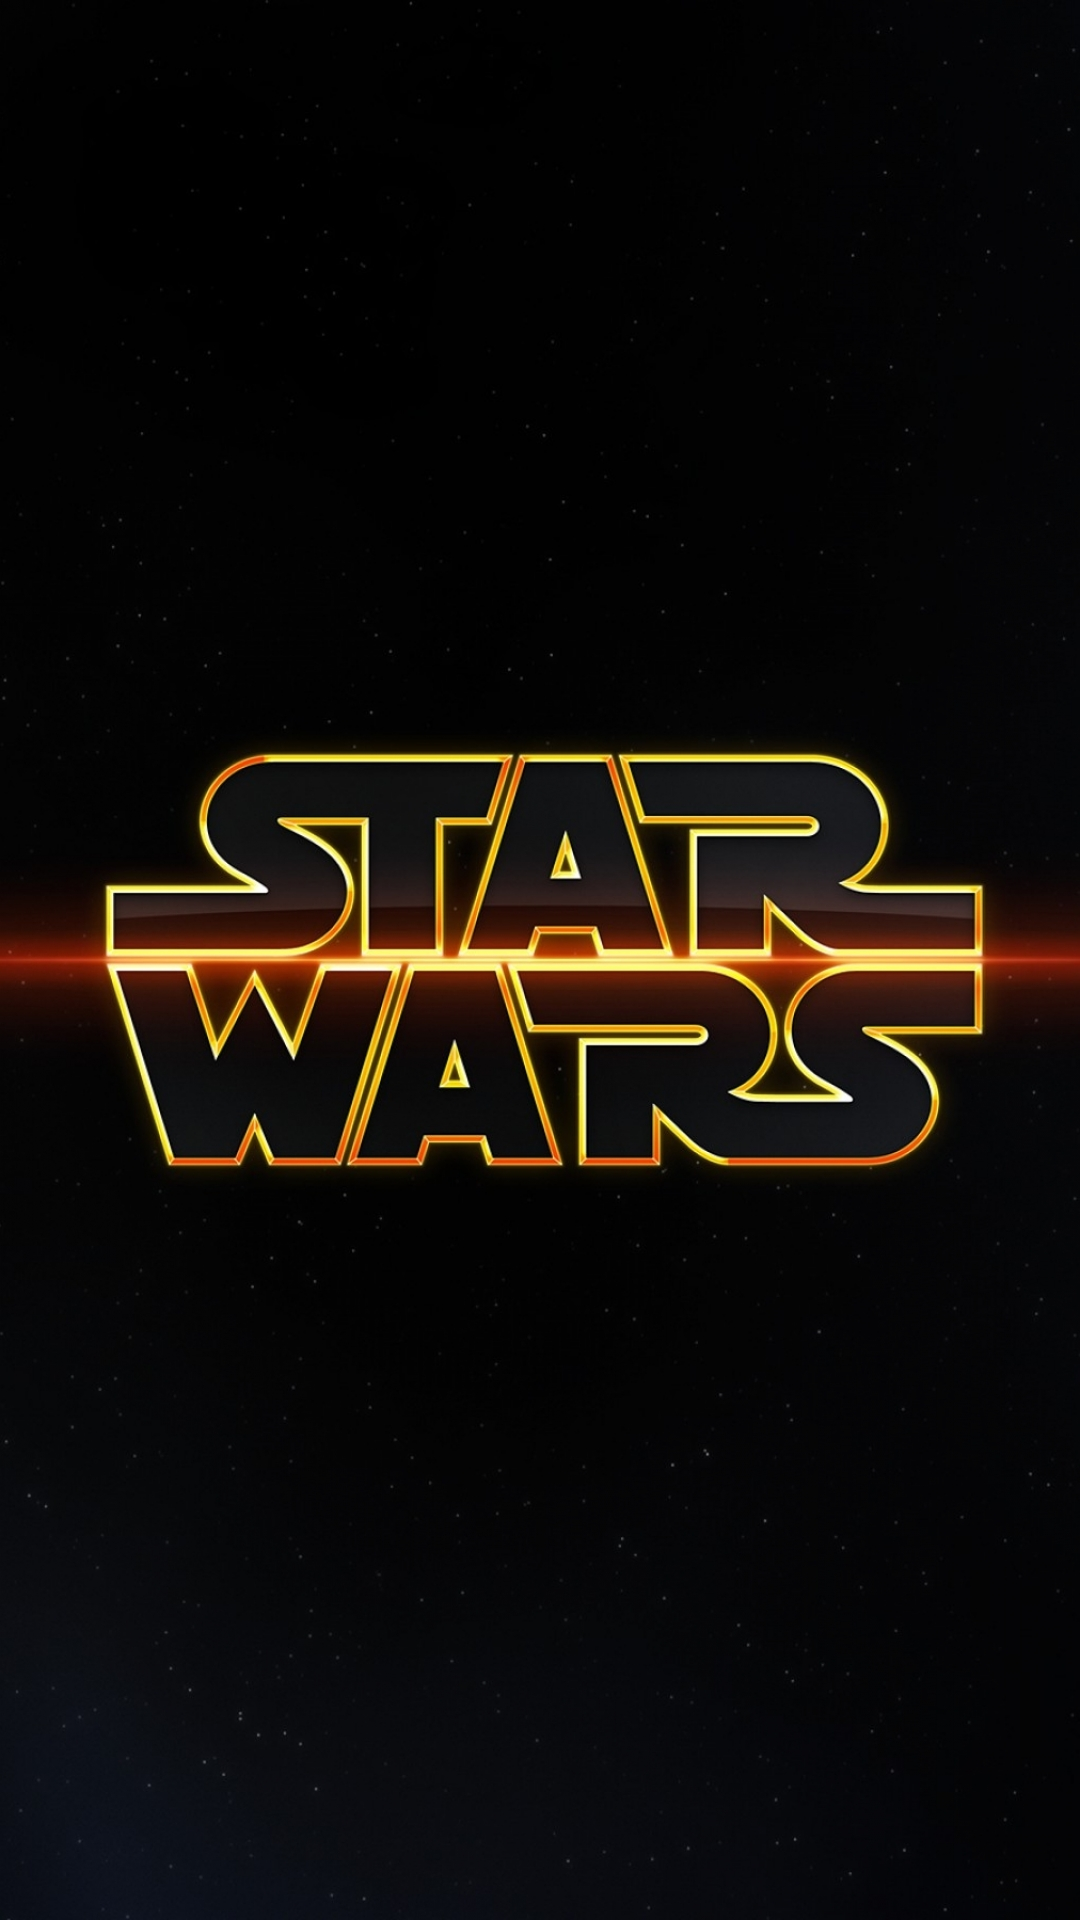 320 Star Wars AppleiPhone 7 Plus 1080x1920 Wallpapers   Mobile 1080x1920